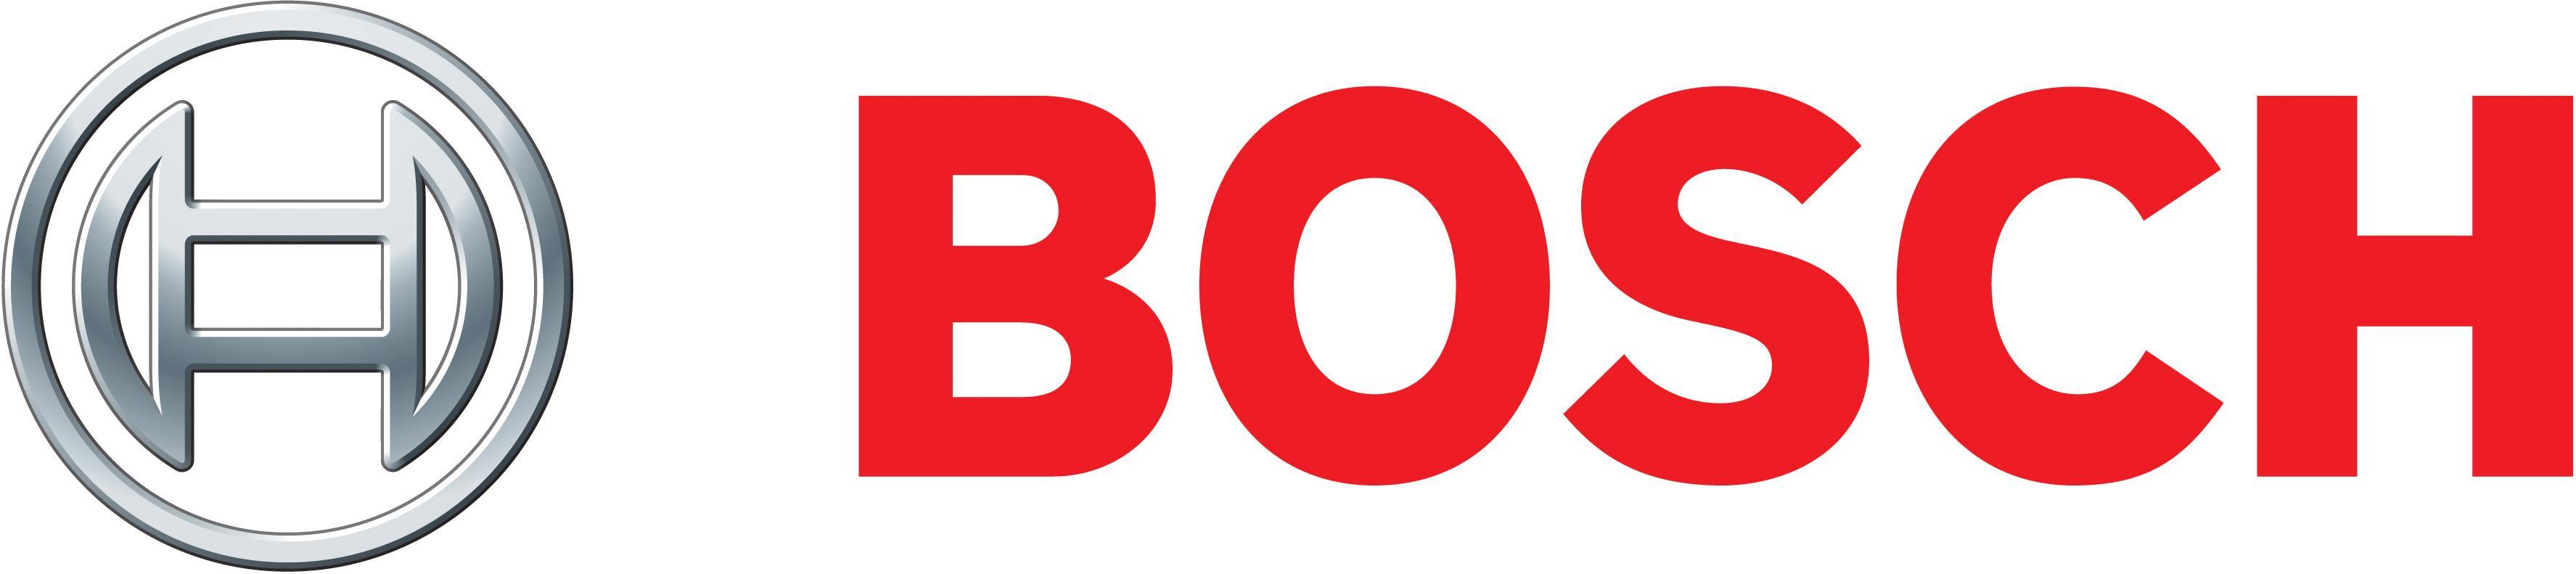 Bosch logo wallpapers HD